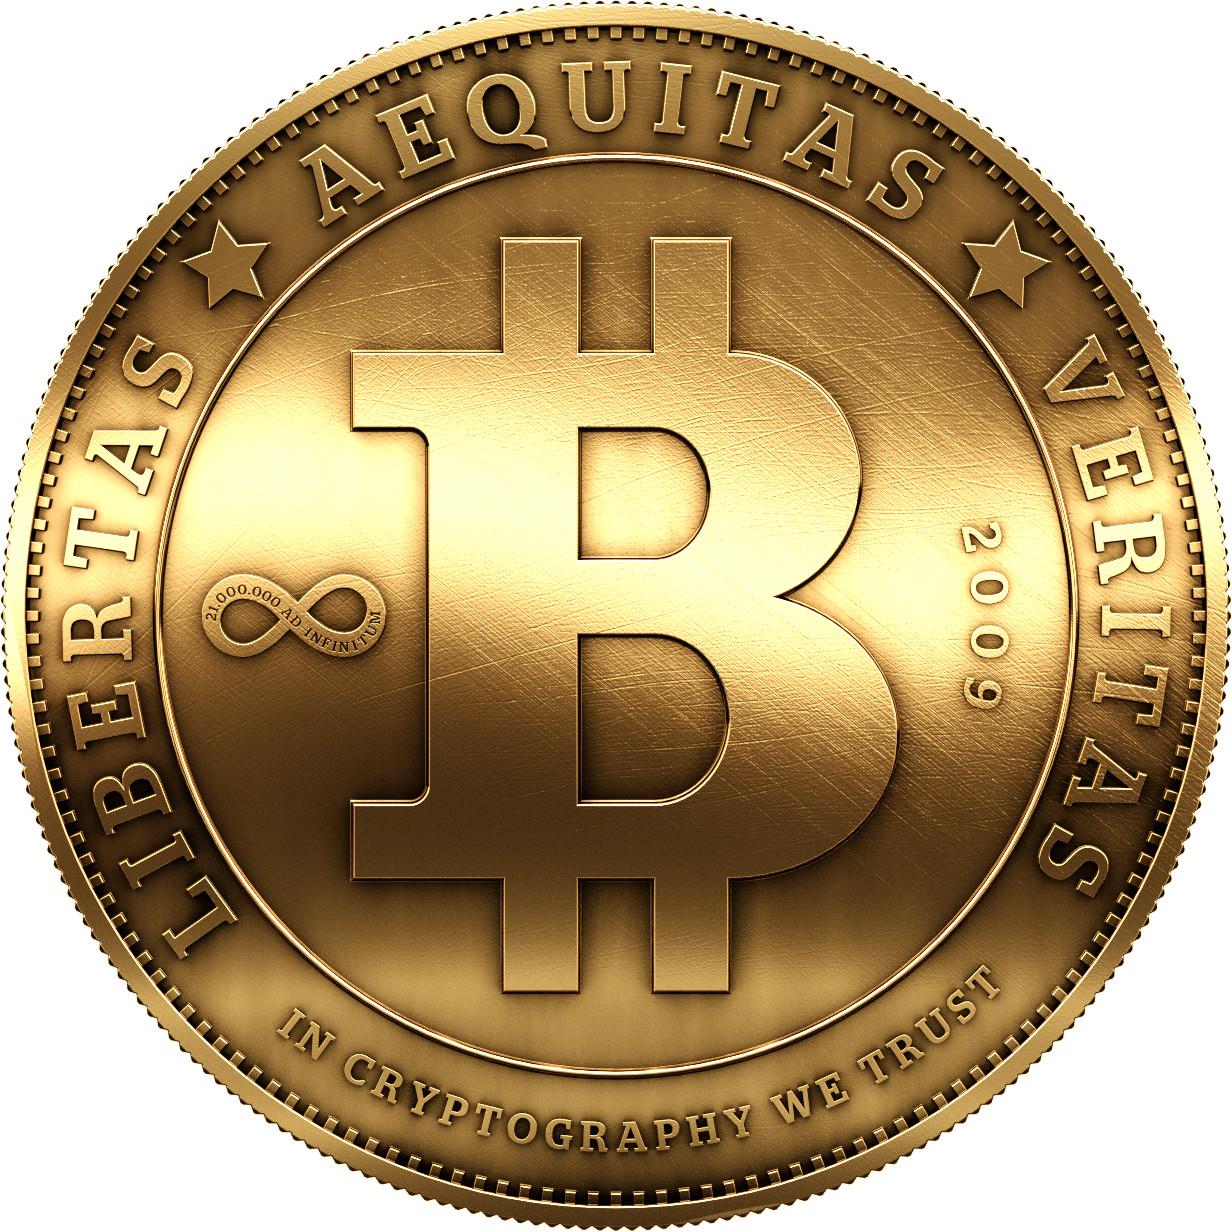 0000 D INFIN OGRAPHY Coin